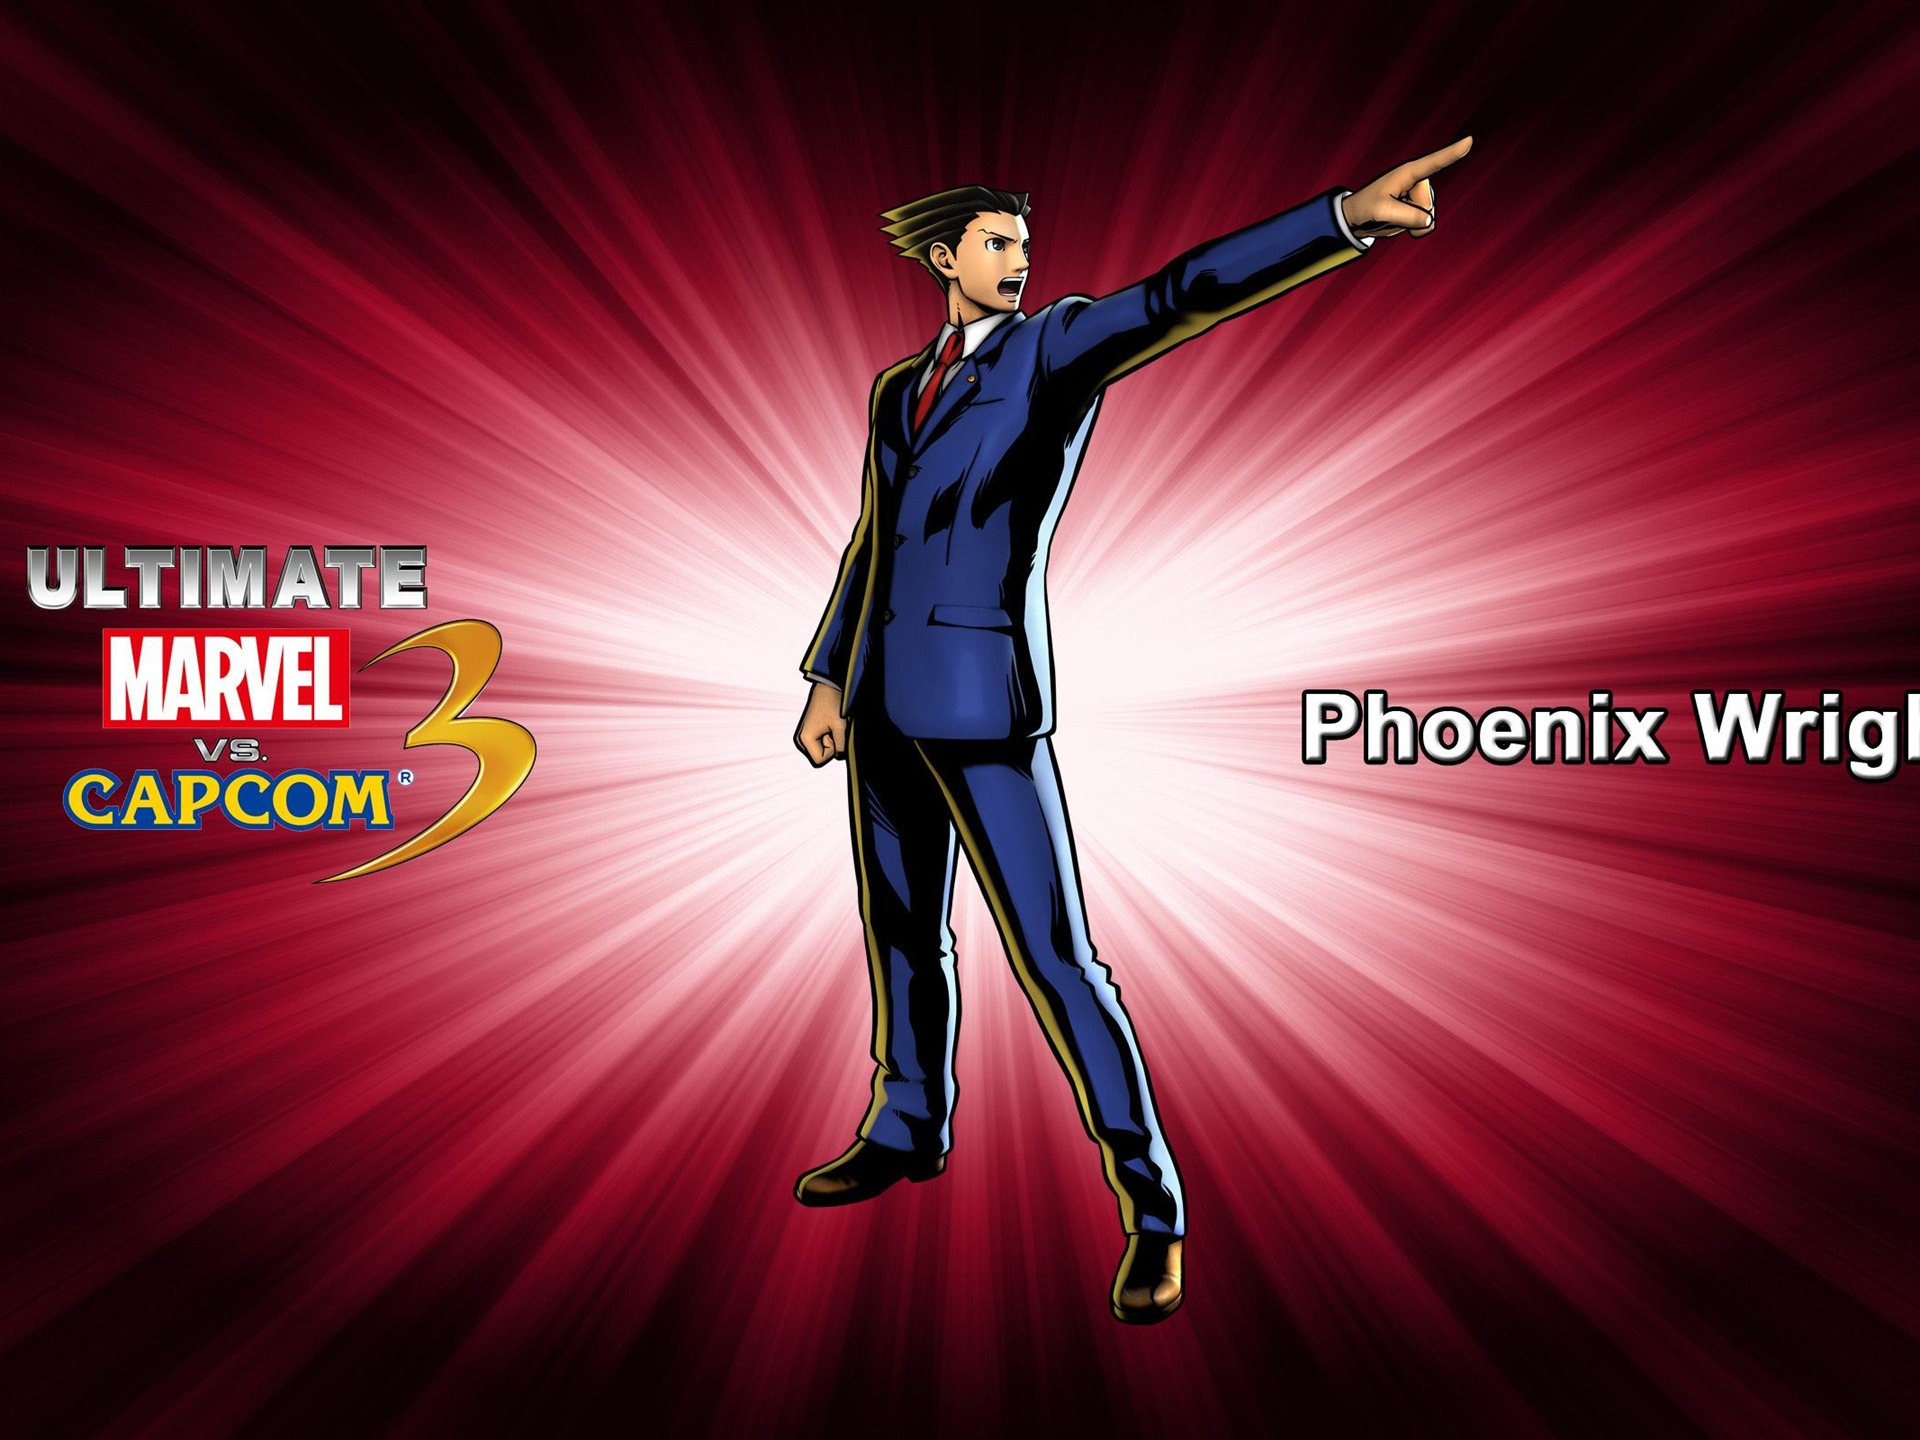 Phoenix Wright Ultimate Marvel Vs Capcom 3 Game Wallpaper Preview